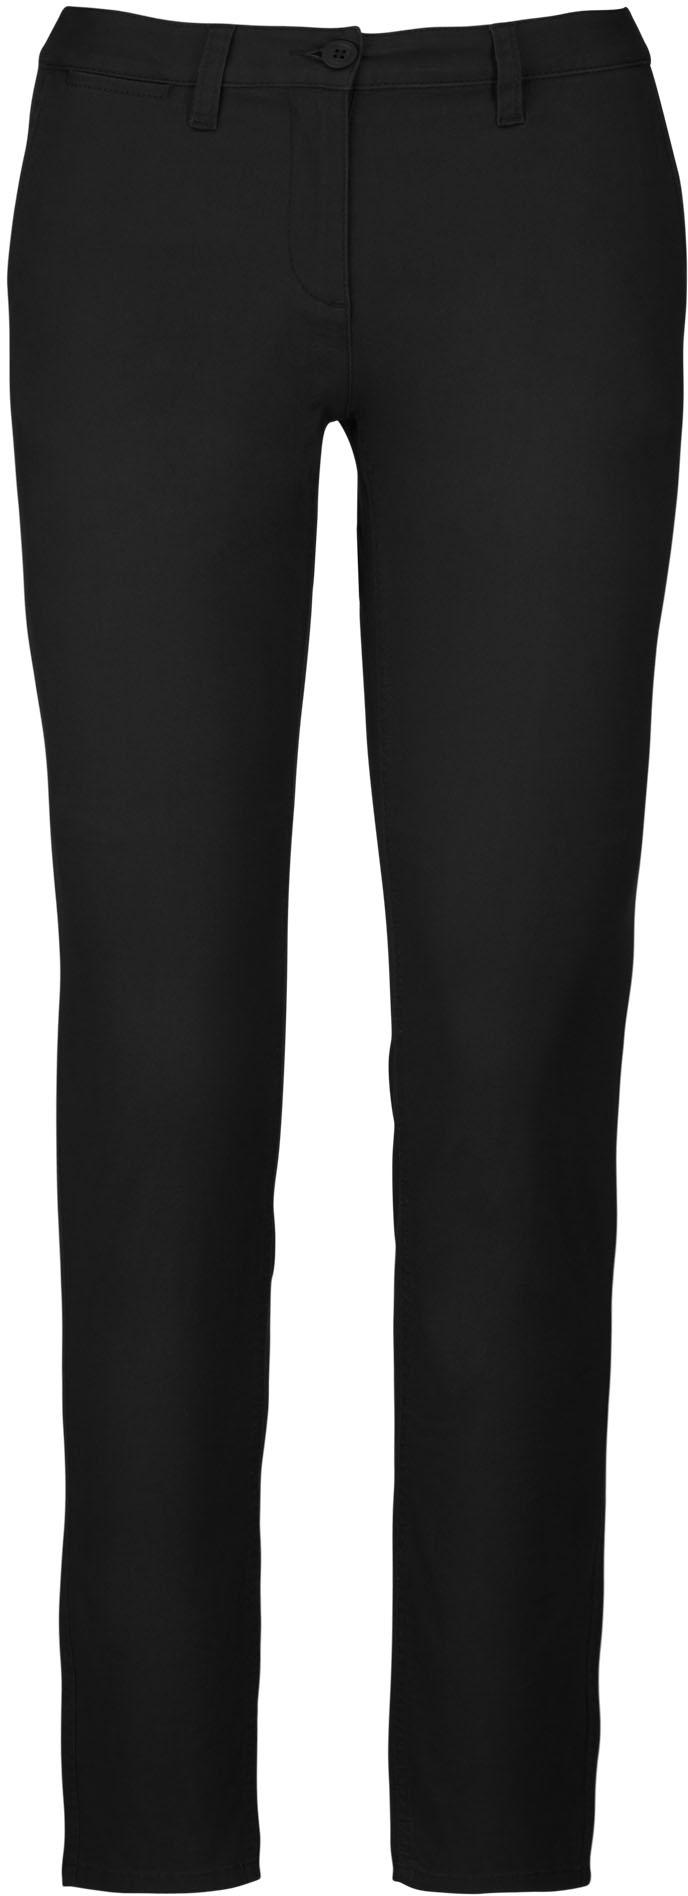 Pantalon chino femme - 2-1479-5